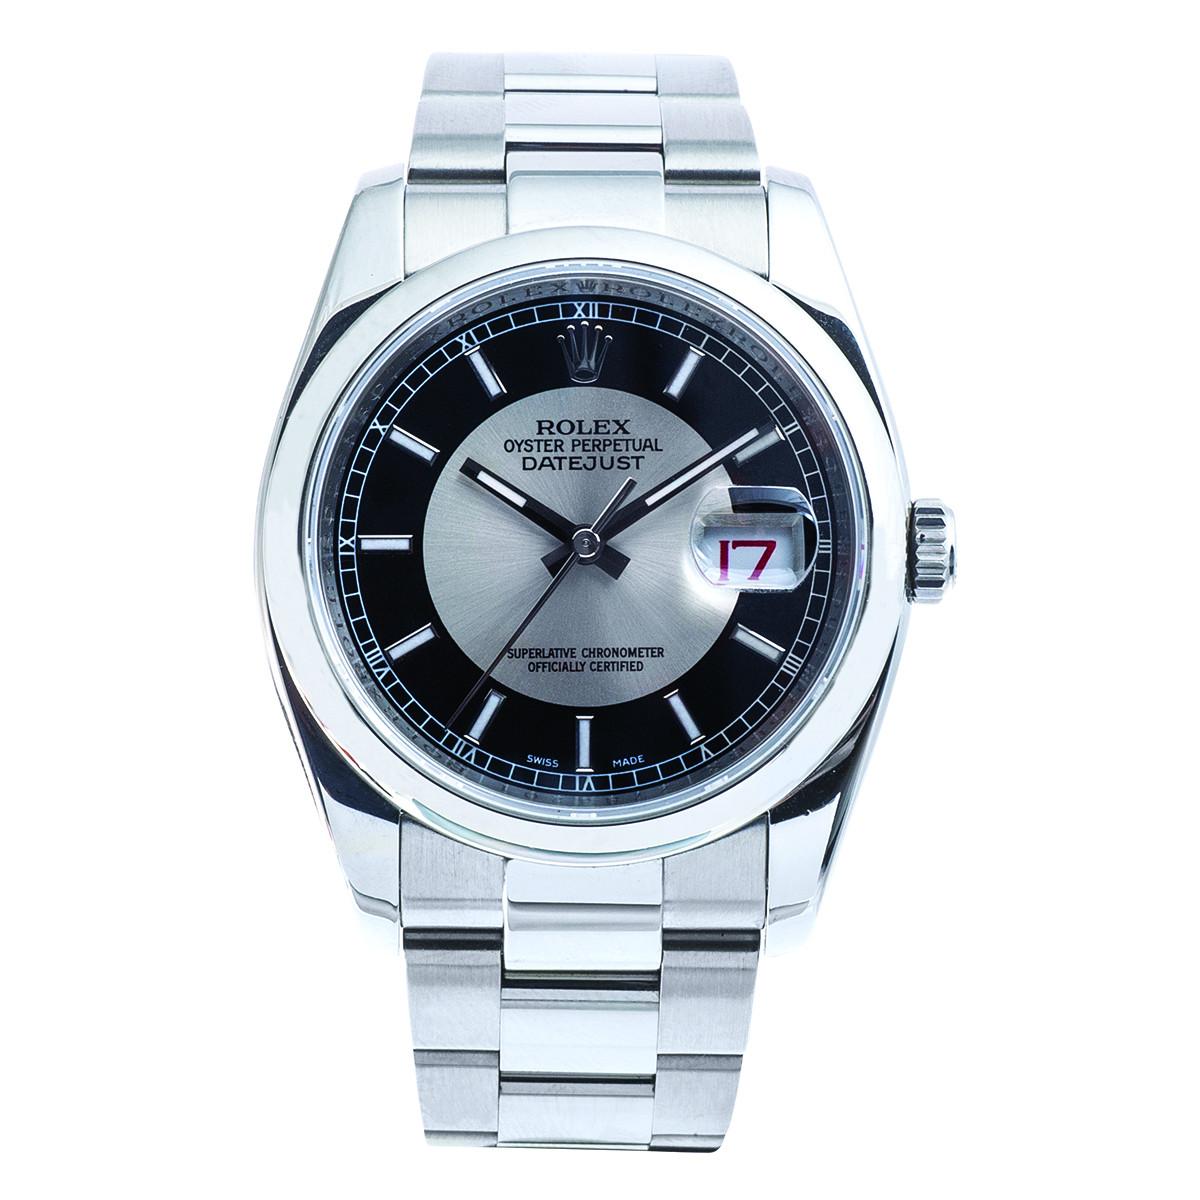 Preowned Men's Rolex Datejust